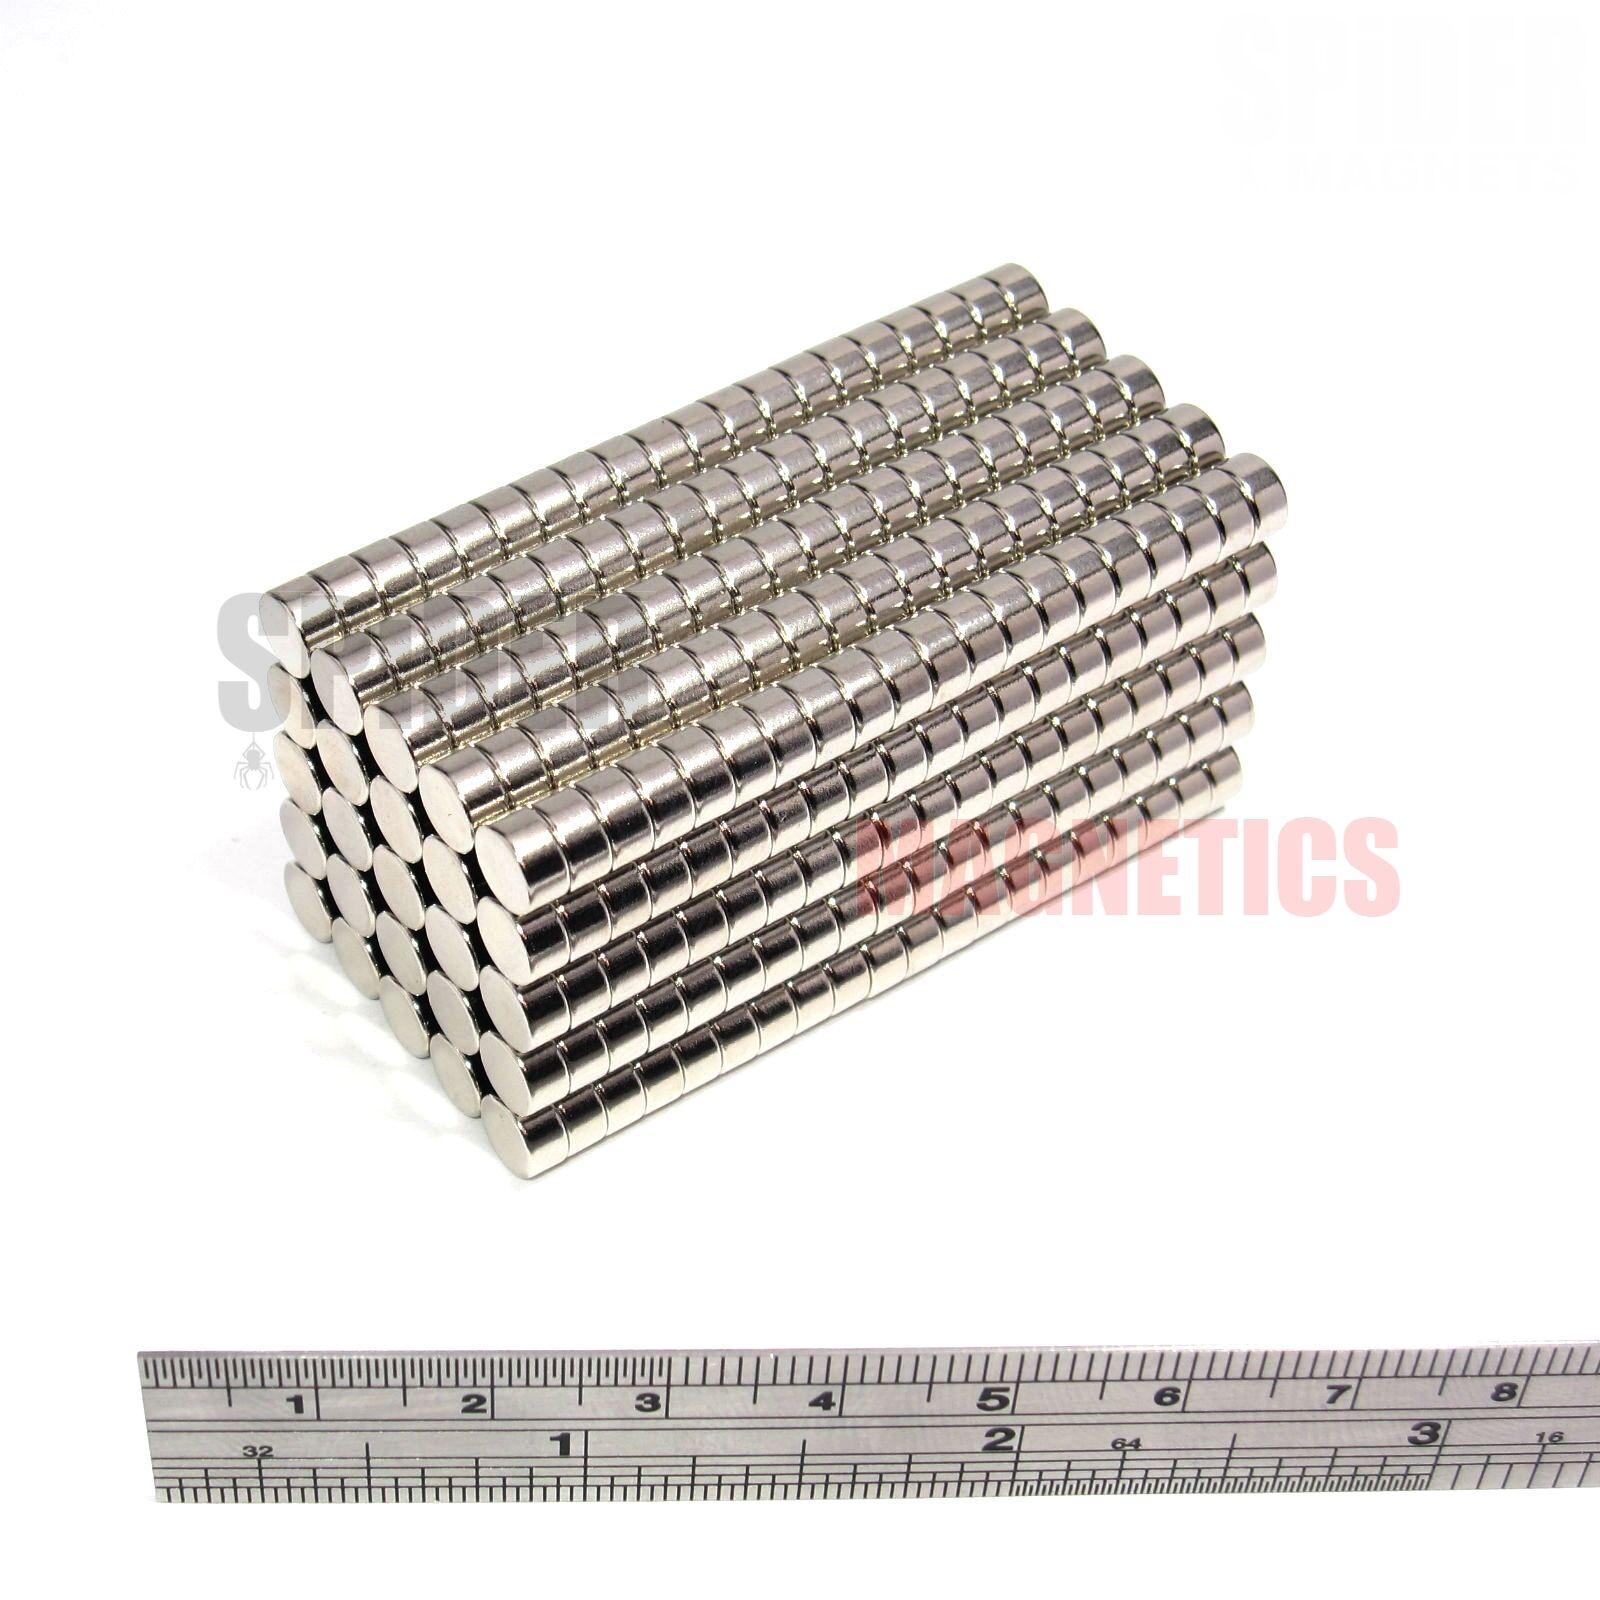 500 Magnets Magnets Magnets 6x3 mm Neodymium Disc small round magnet 6mm dia x 3mm craft fridge 3ed75d